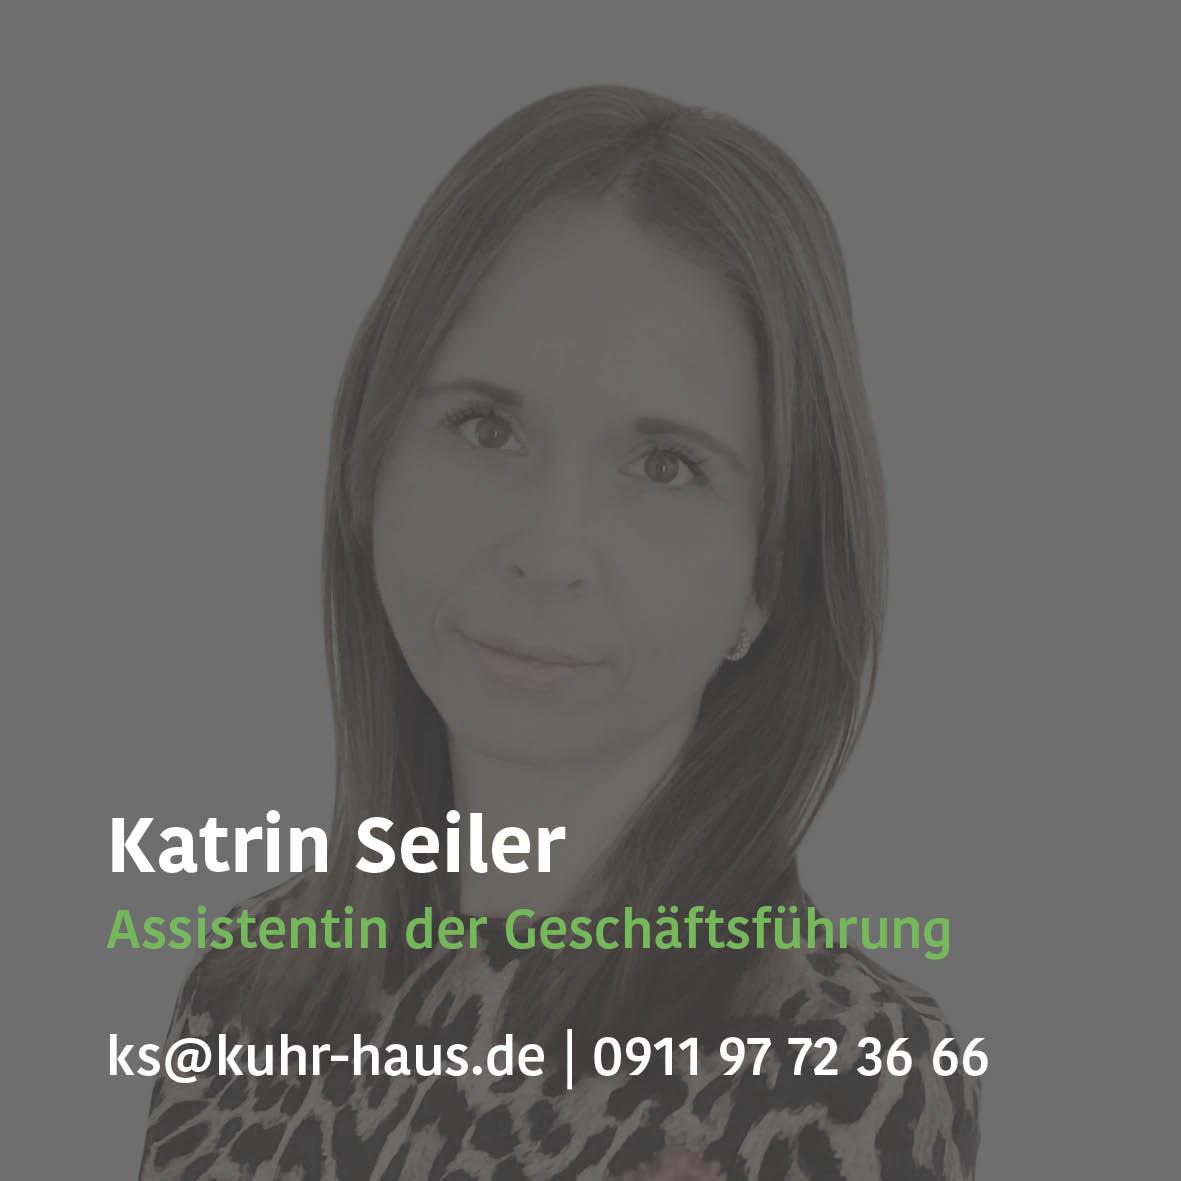 Ka_Seiler_Bild_Kontakt